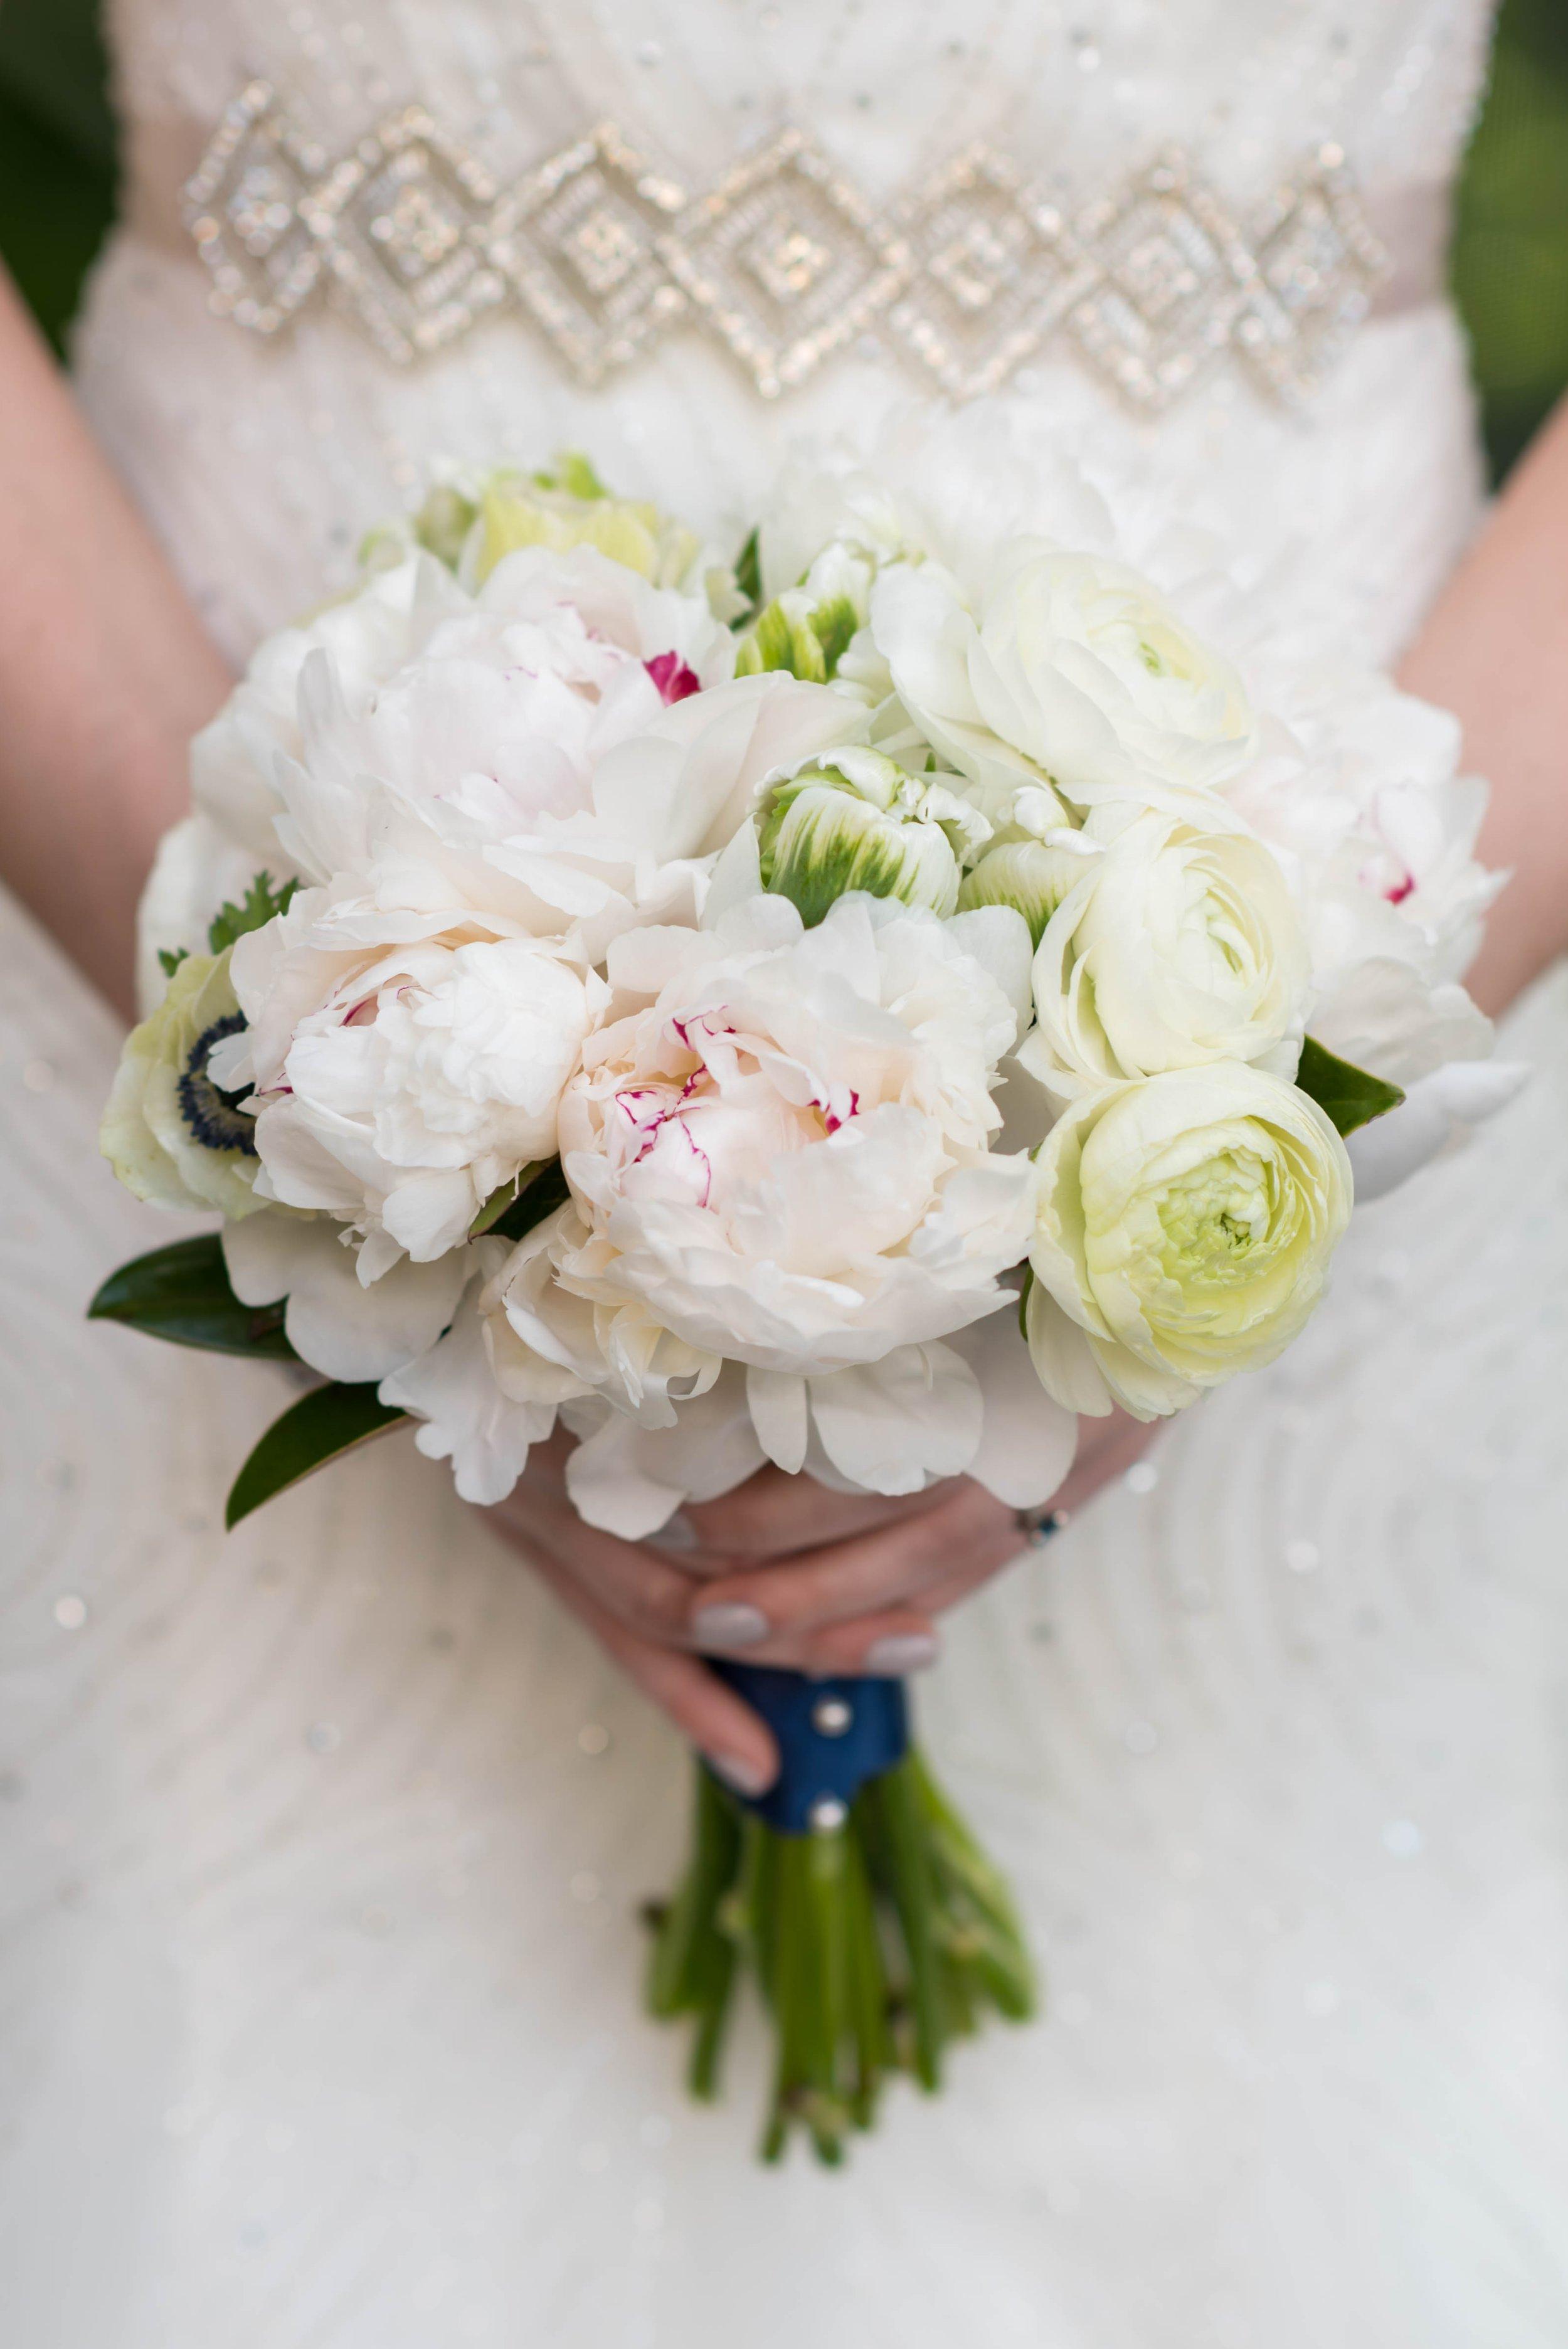 Beautiful blush bouquet by Atlanta wedding florist  K & Co Floral Design